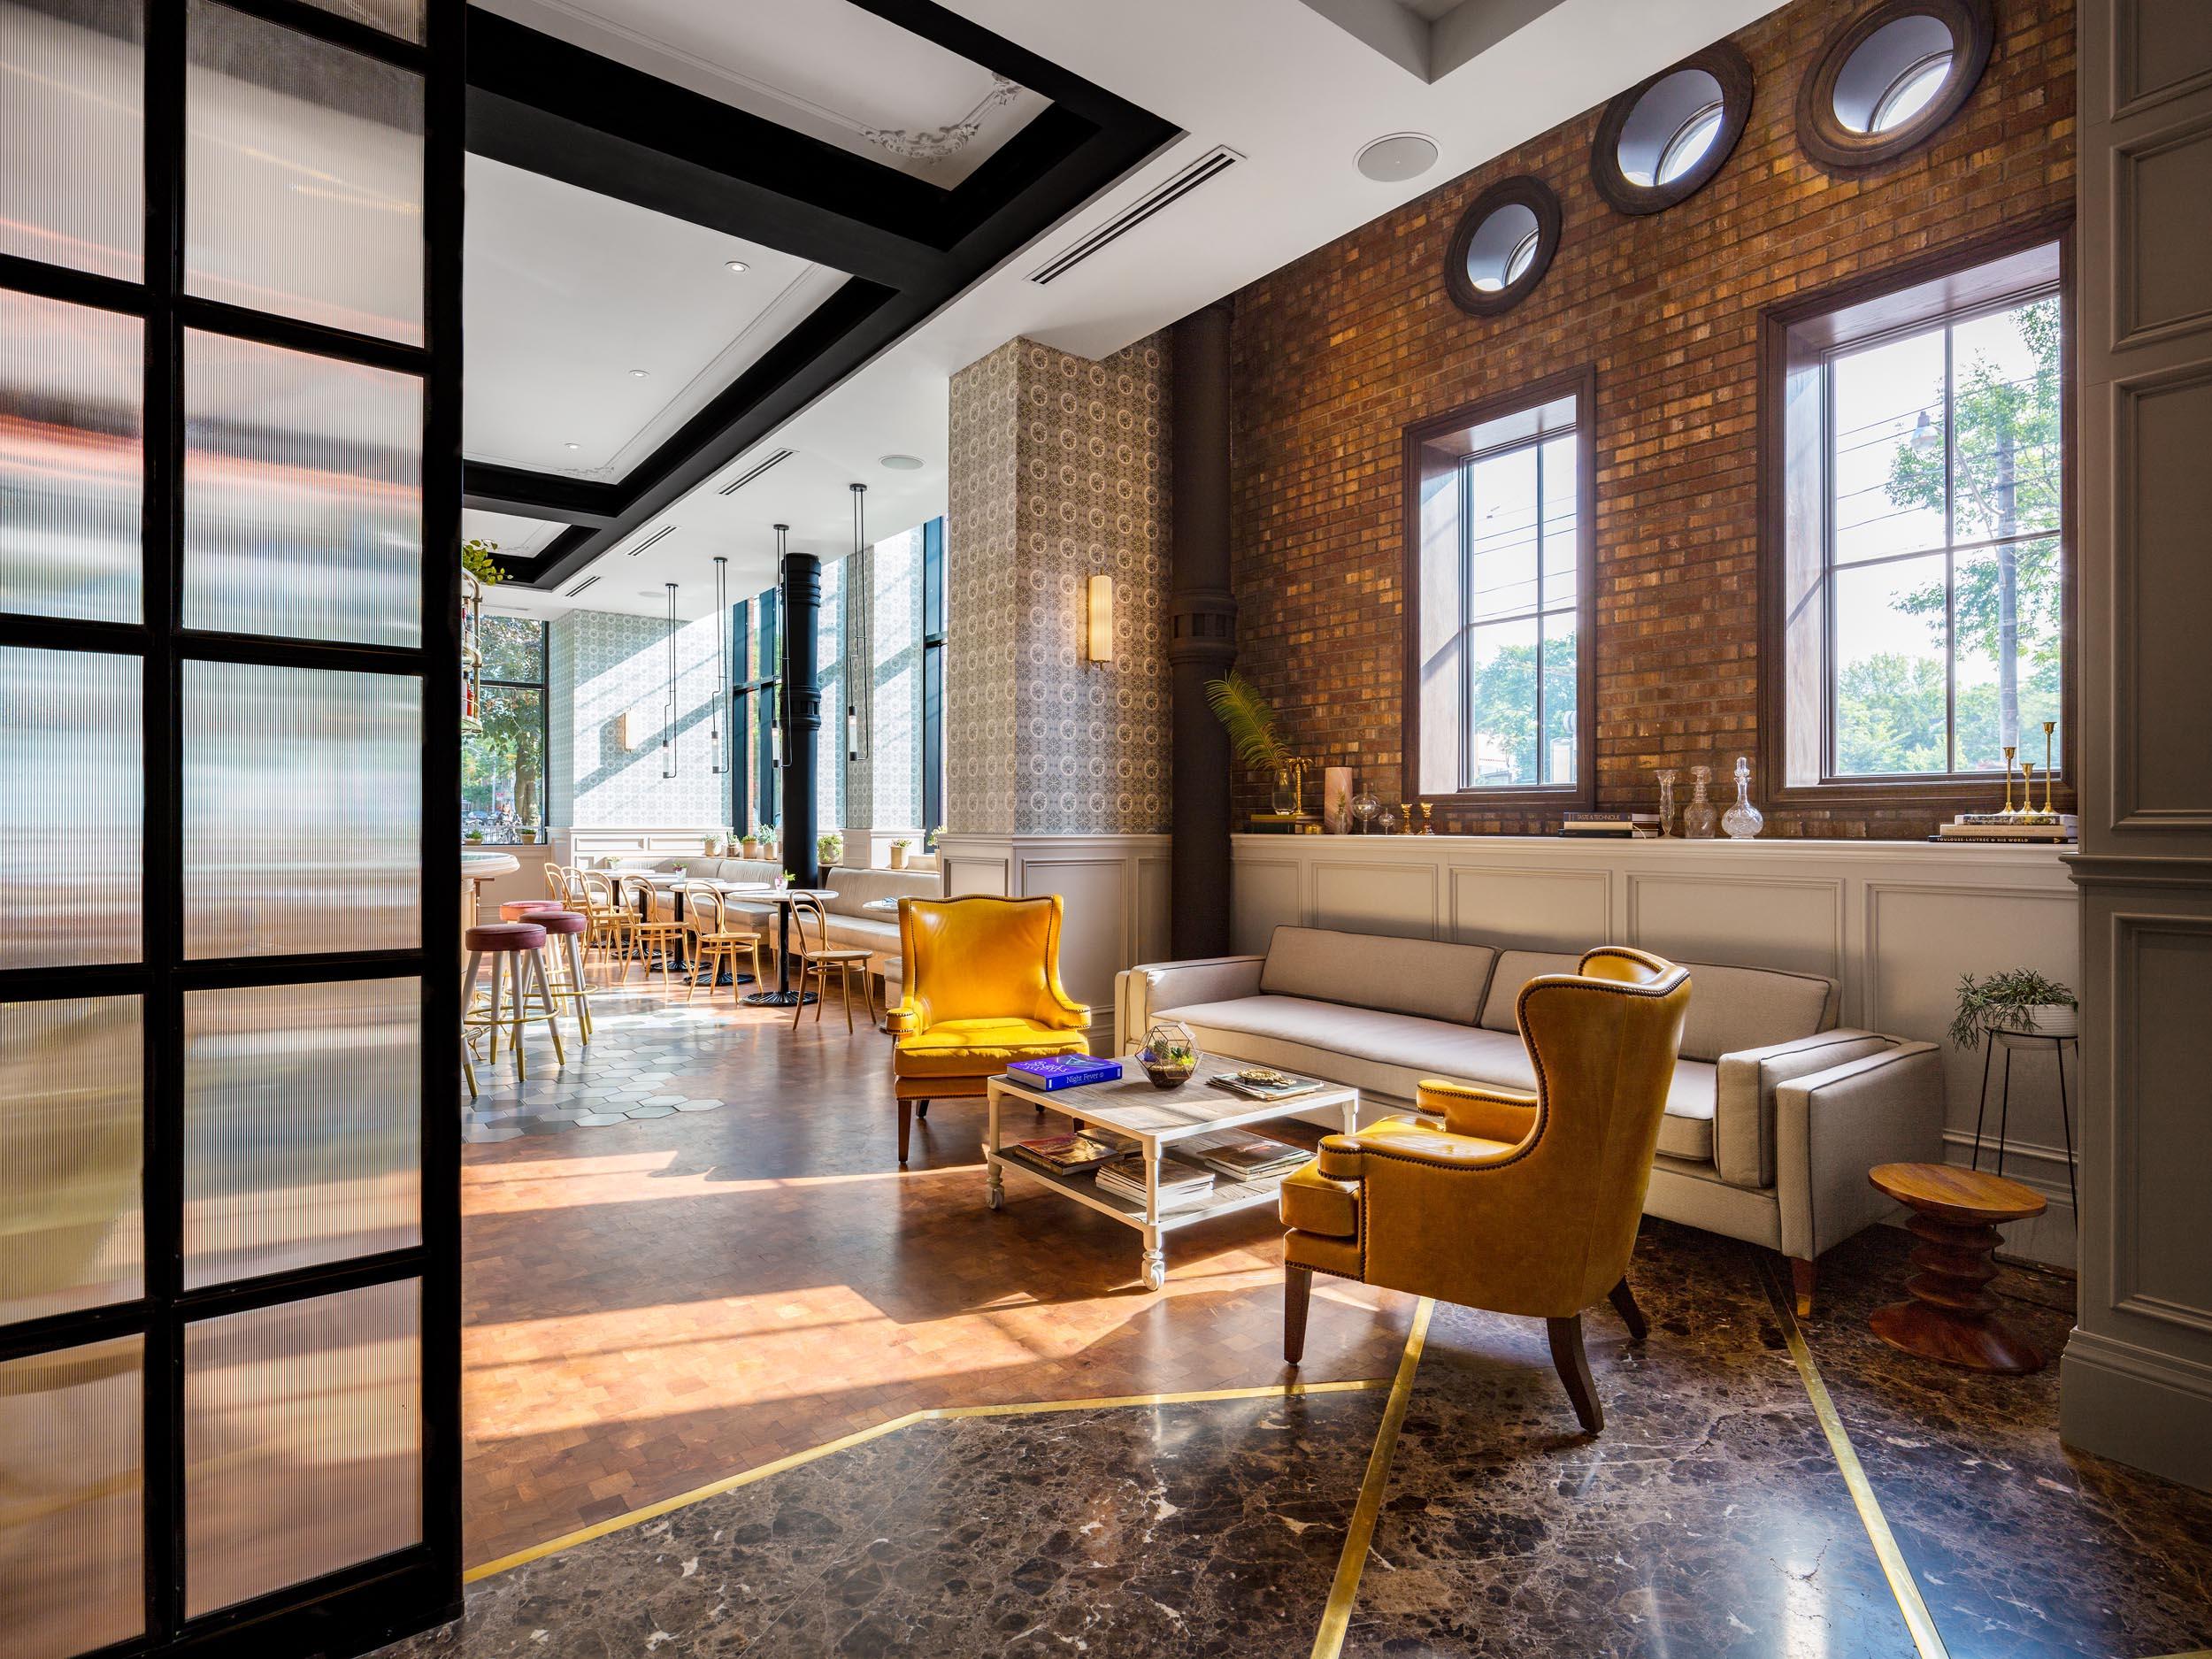 Toronto Interior Hotel Photography Broadview Modern Architecture